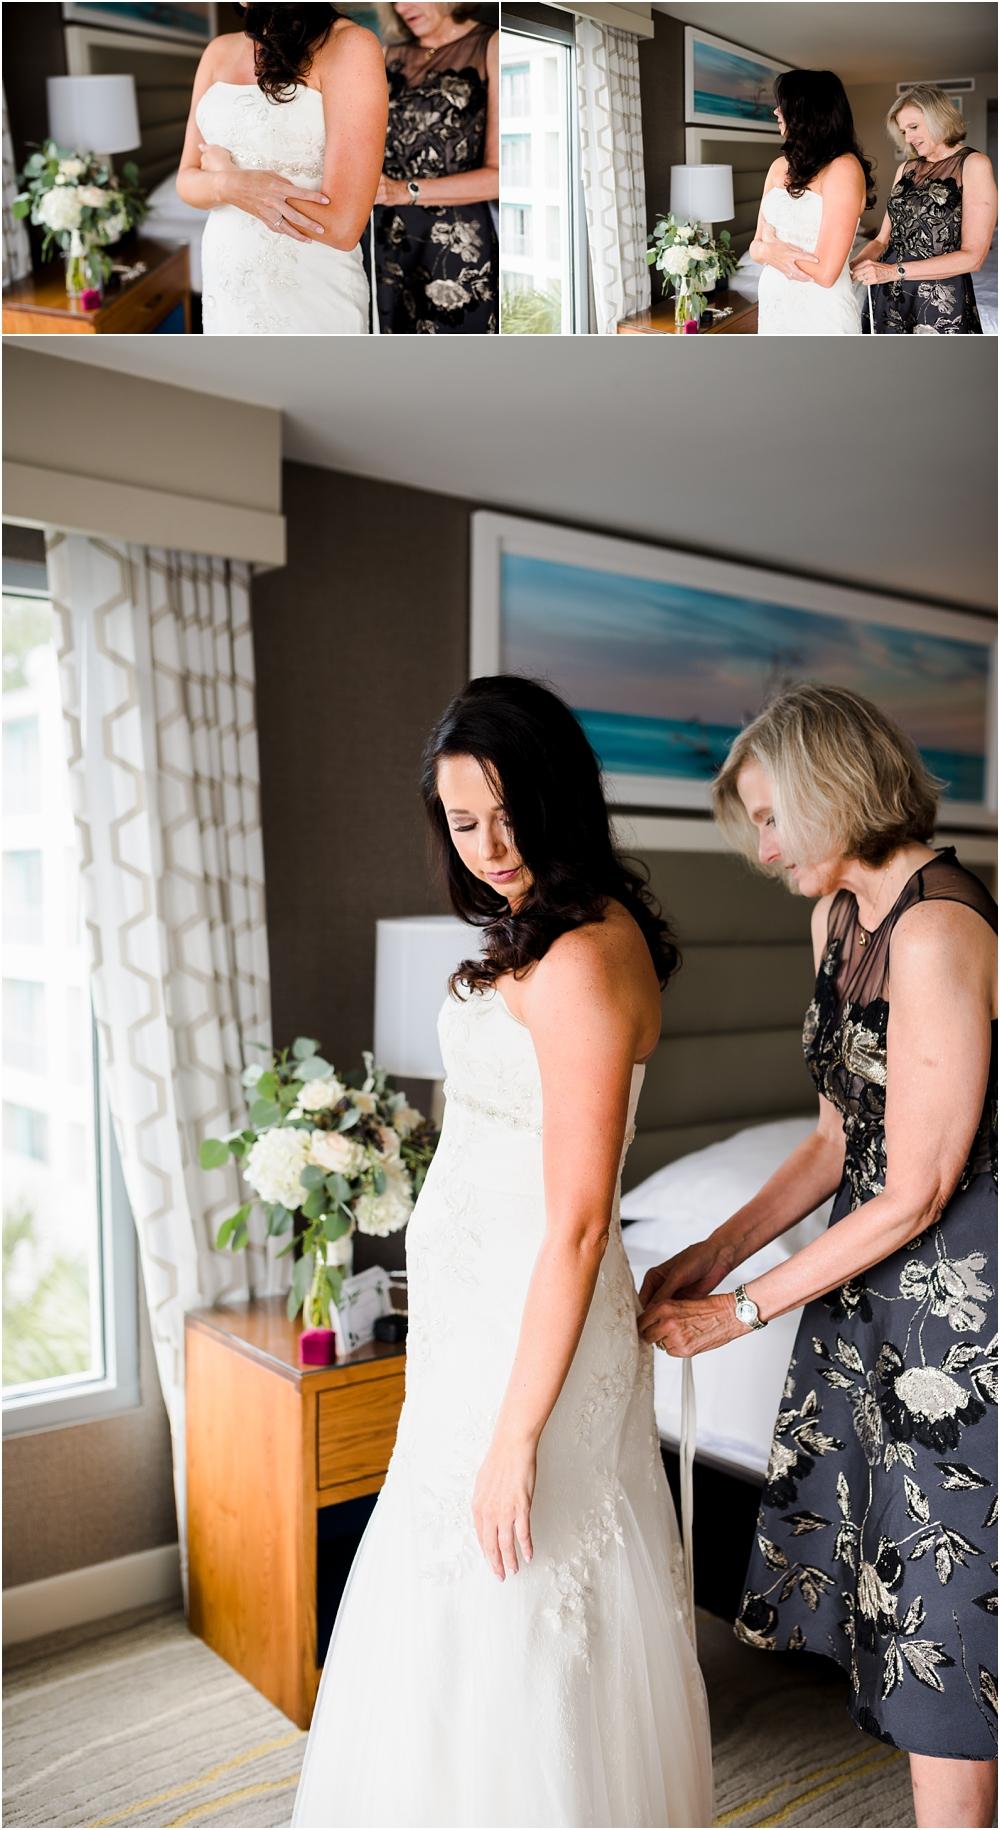 quinn-bay-point-sheraton-florida-wedding-photographer-kiersten-grant-19.jpg